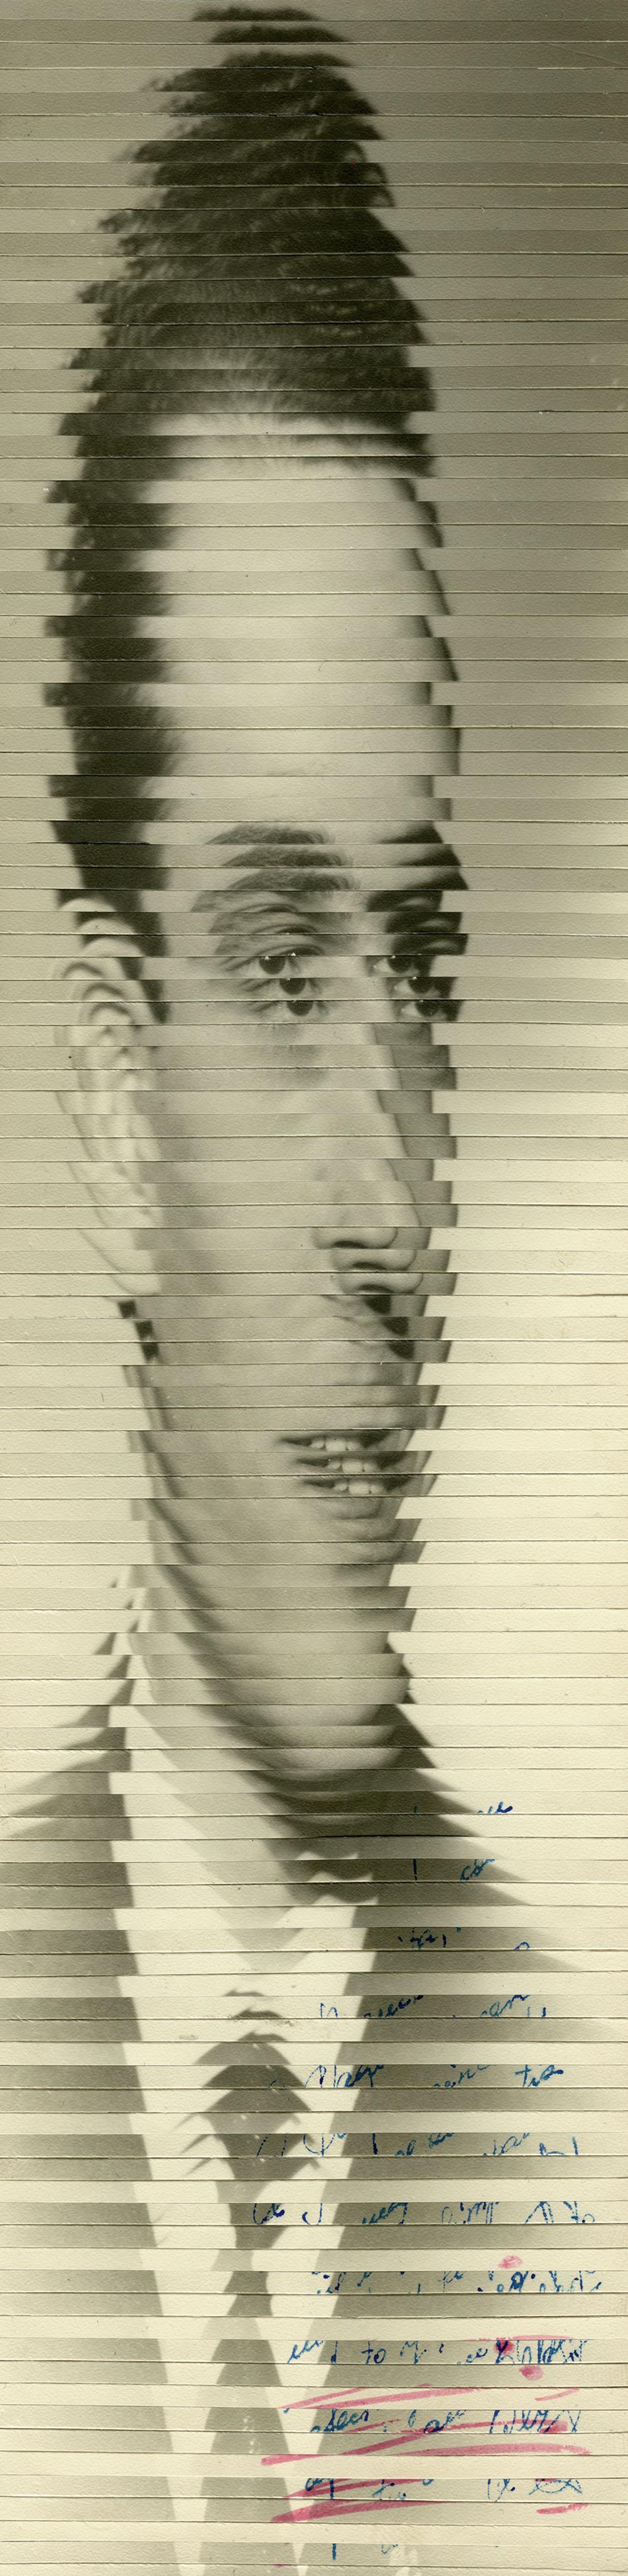 collage_paquito